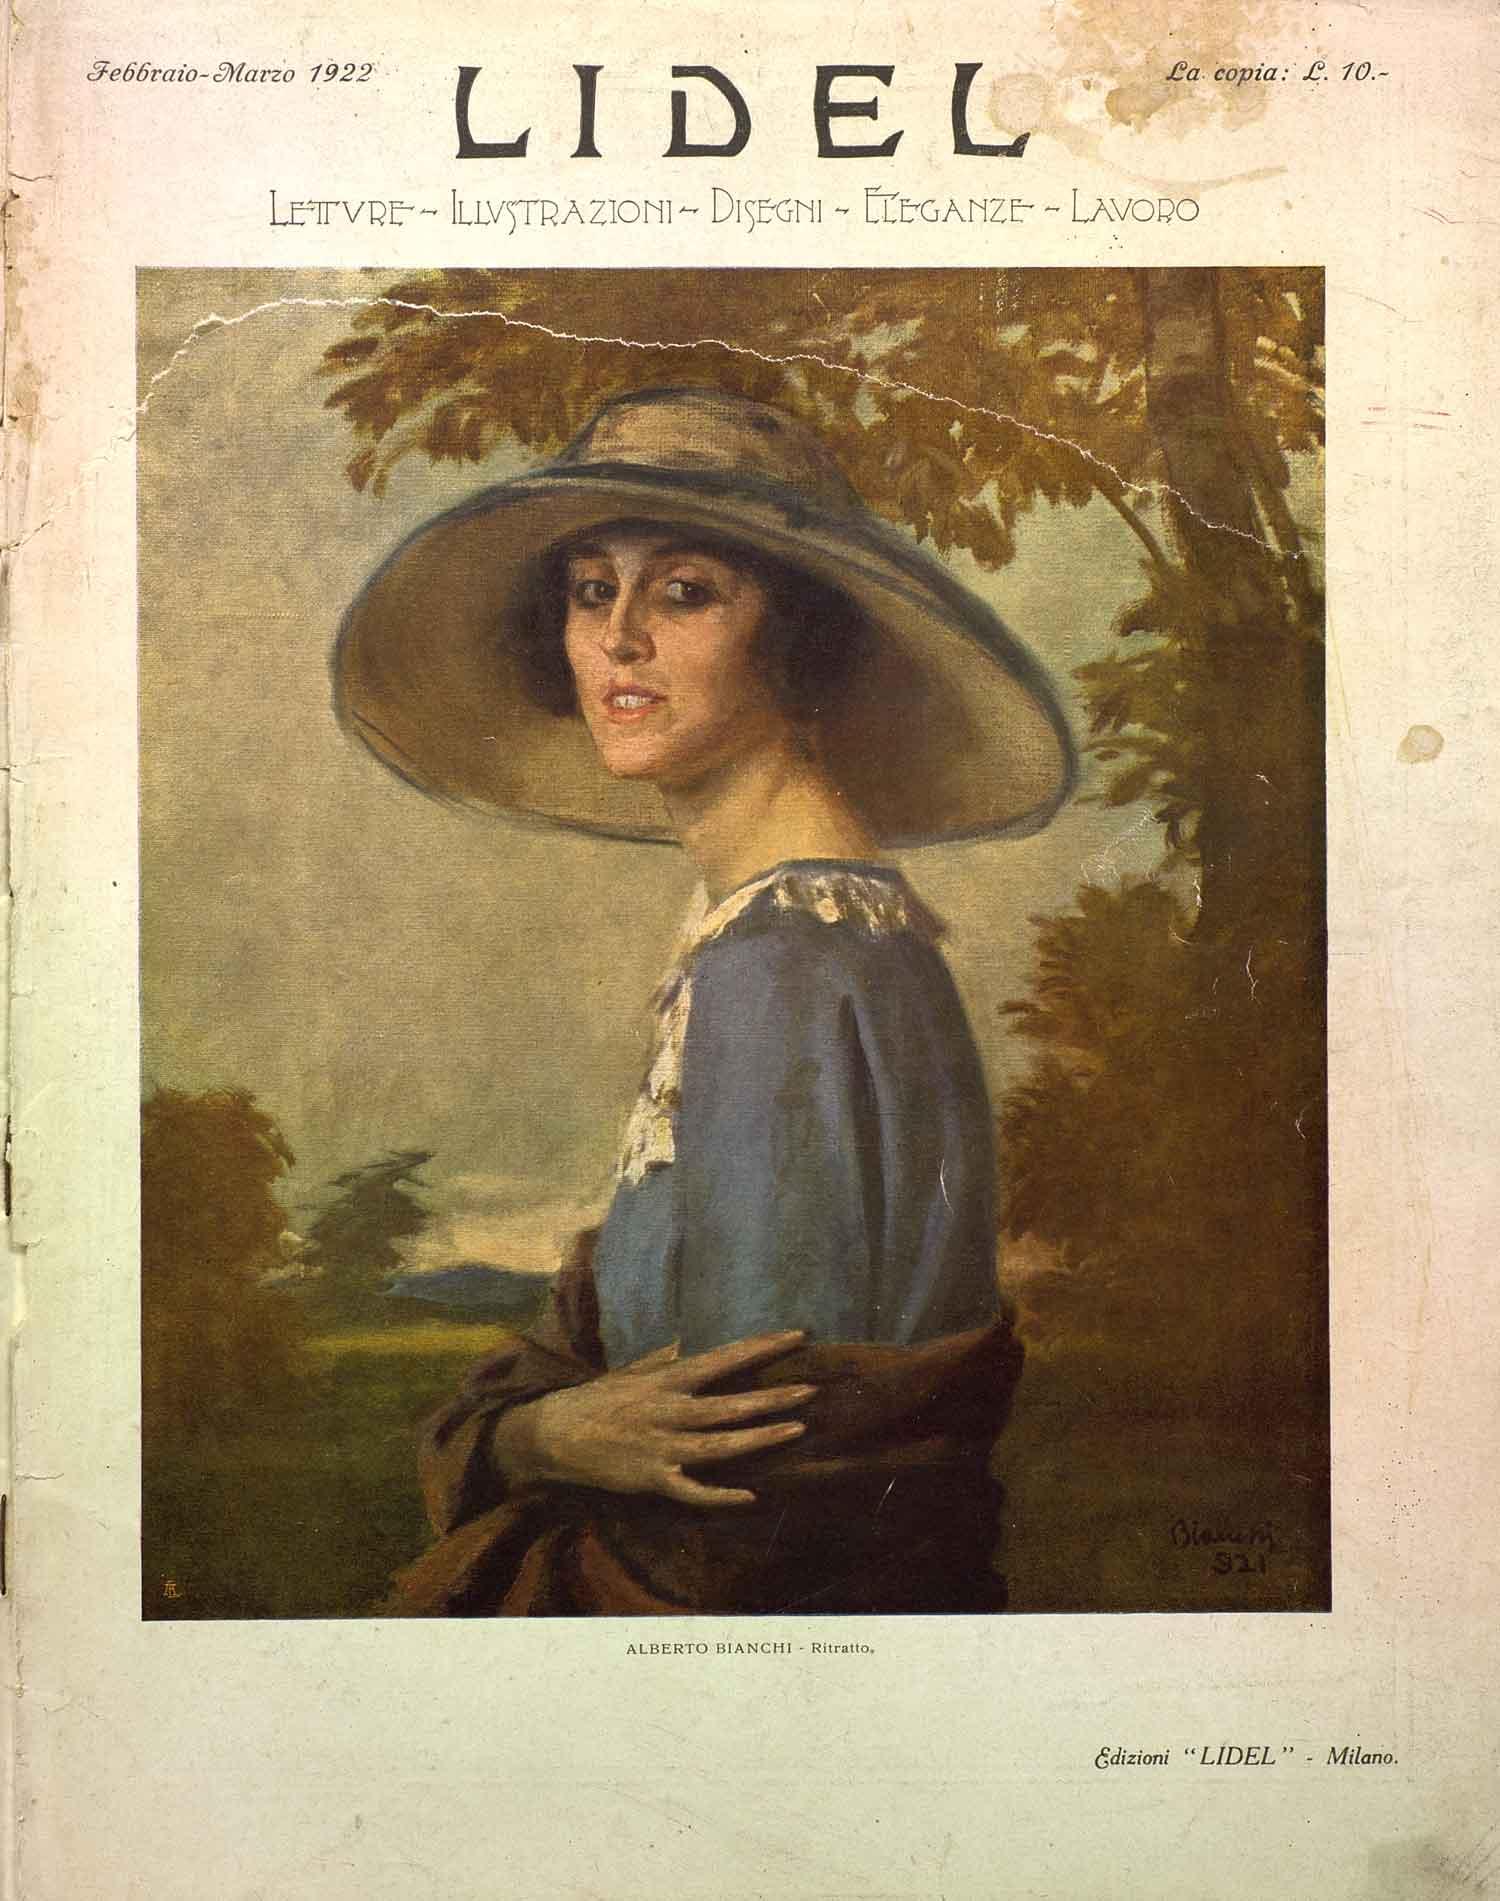 Italiae Fashion: LIDEL 1919 – 1935. A cura di Emanuele Casalena